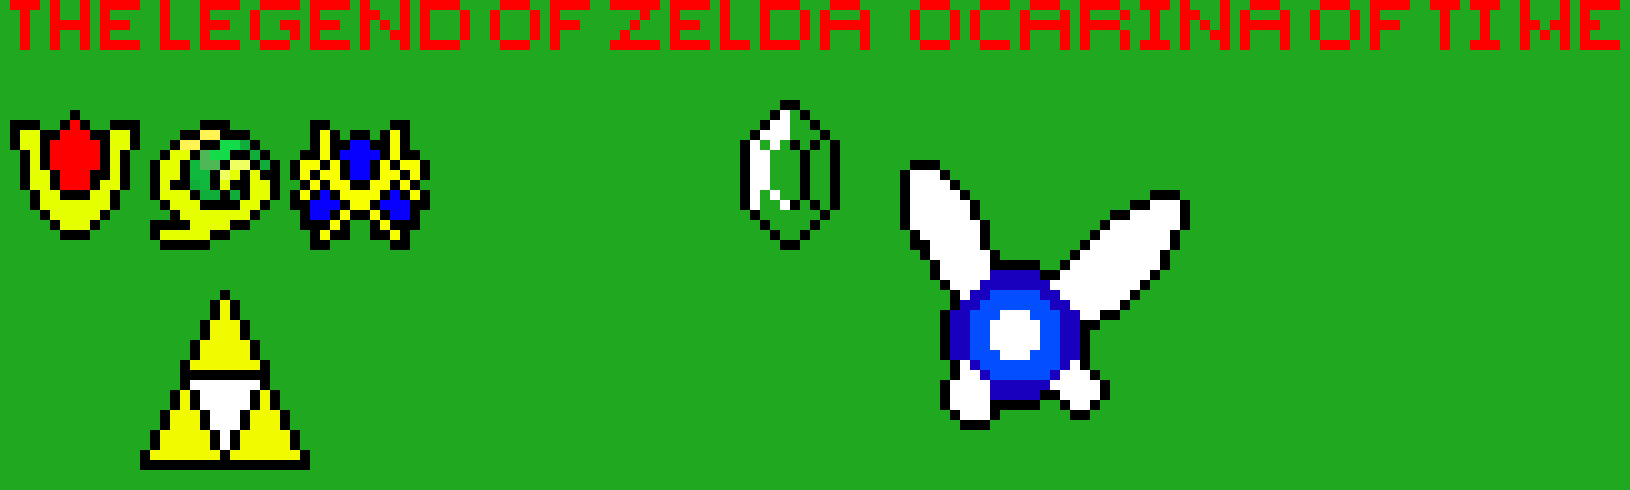 Legend Of Zelda Ocarina Of Time Pixel Art Maker